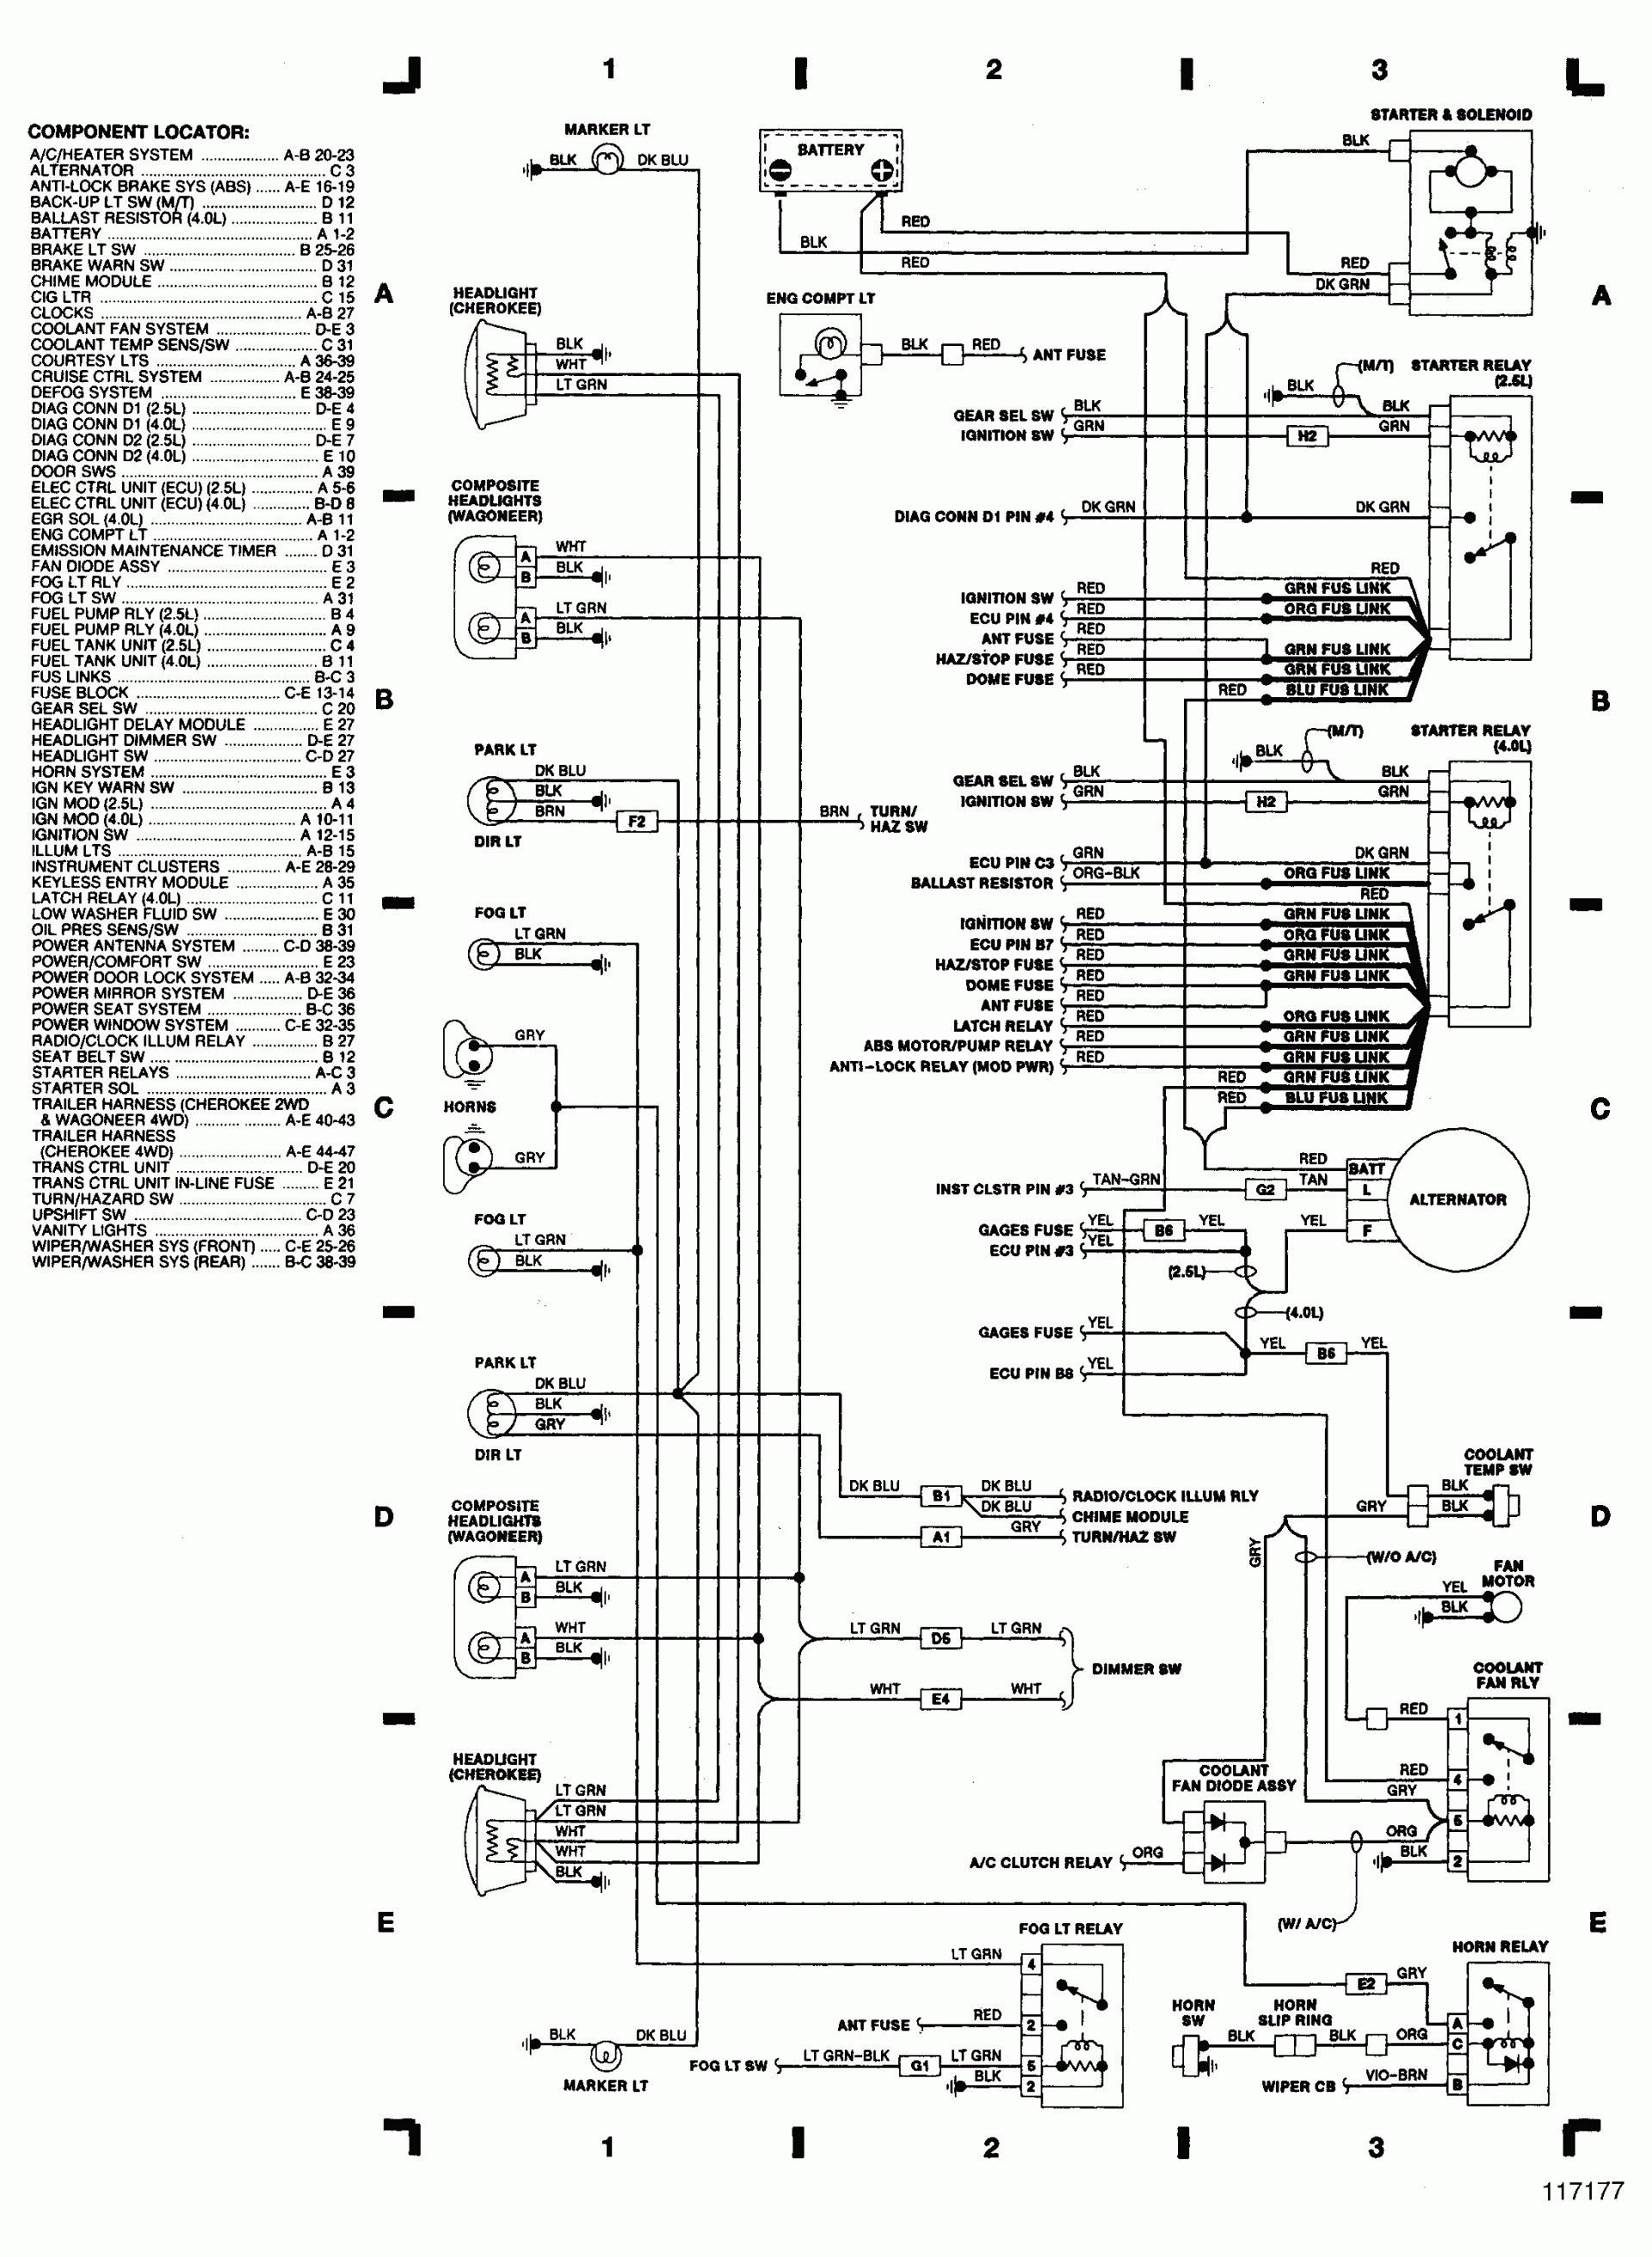 John Deere 345 Wiering Diagram 55c0 John Deere Stereo Wiring Diagram Of John Deere 345 Wiering Diagram